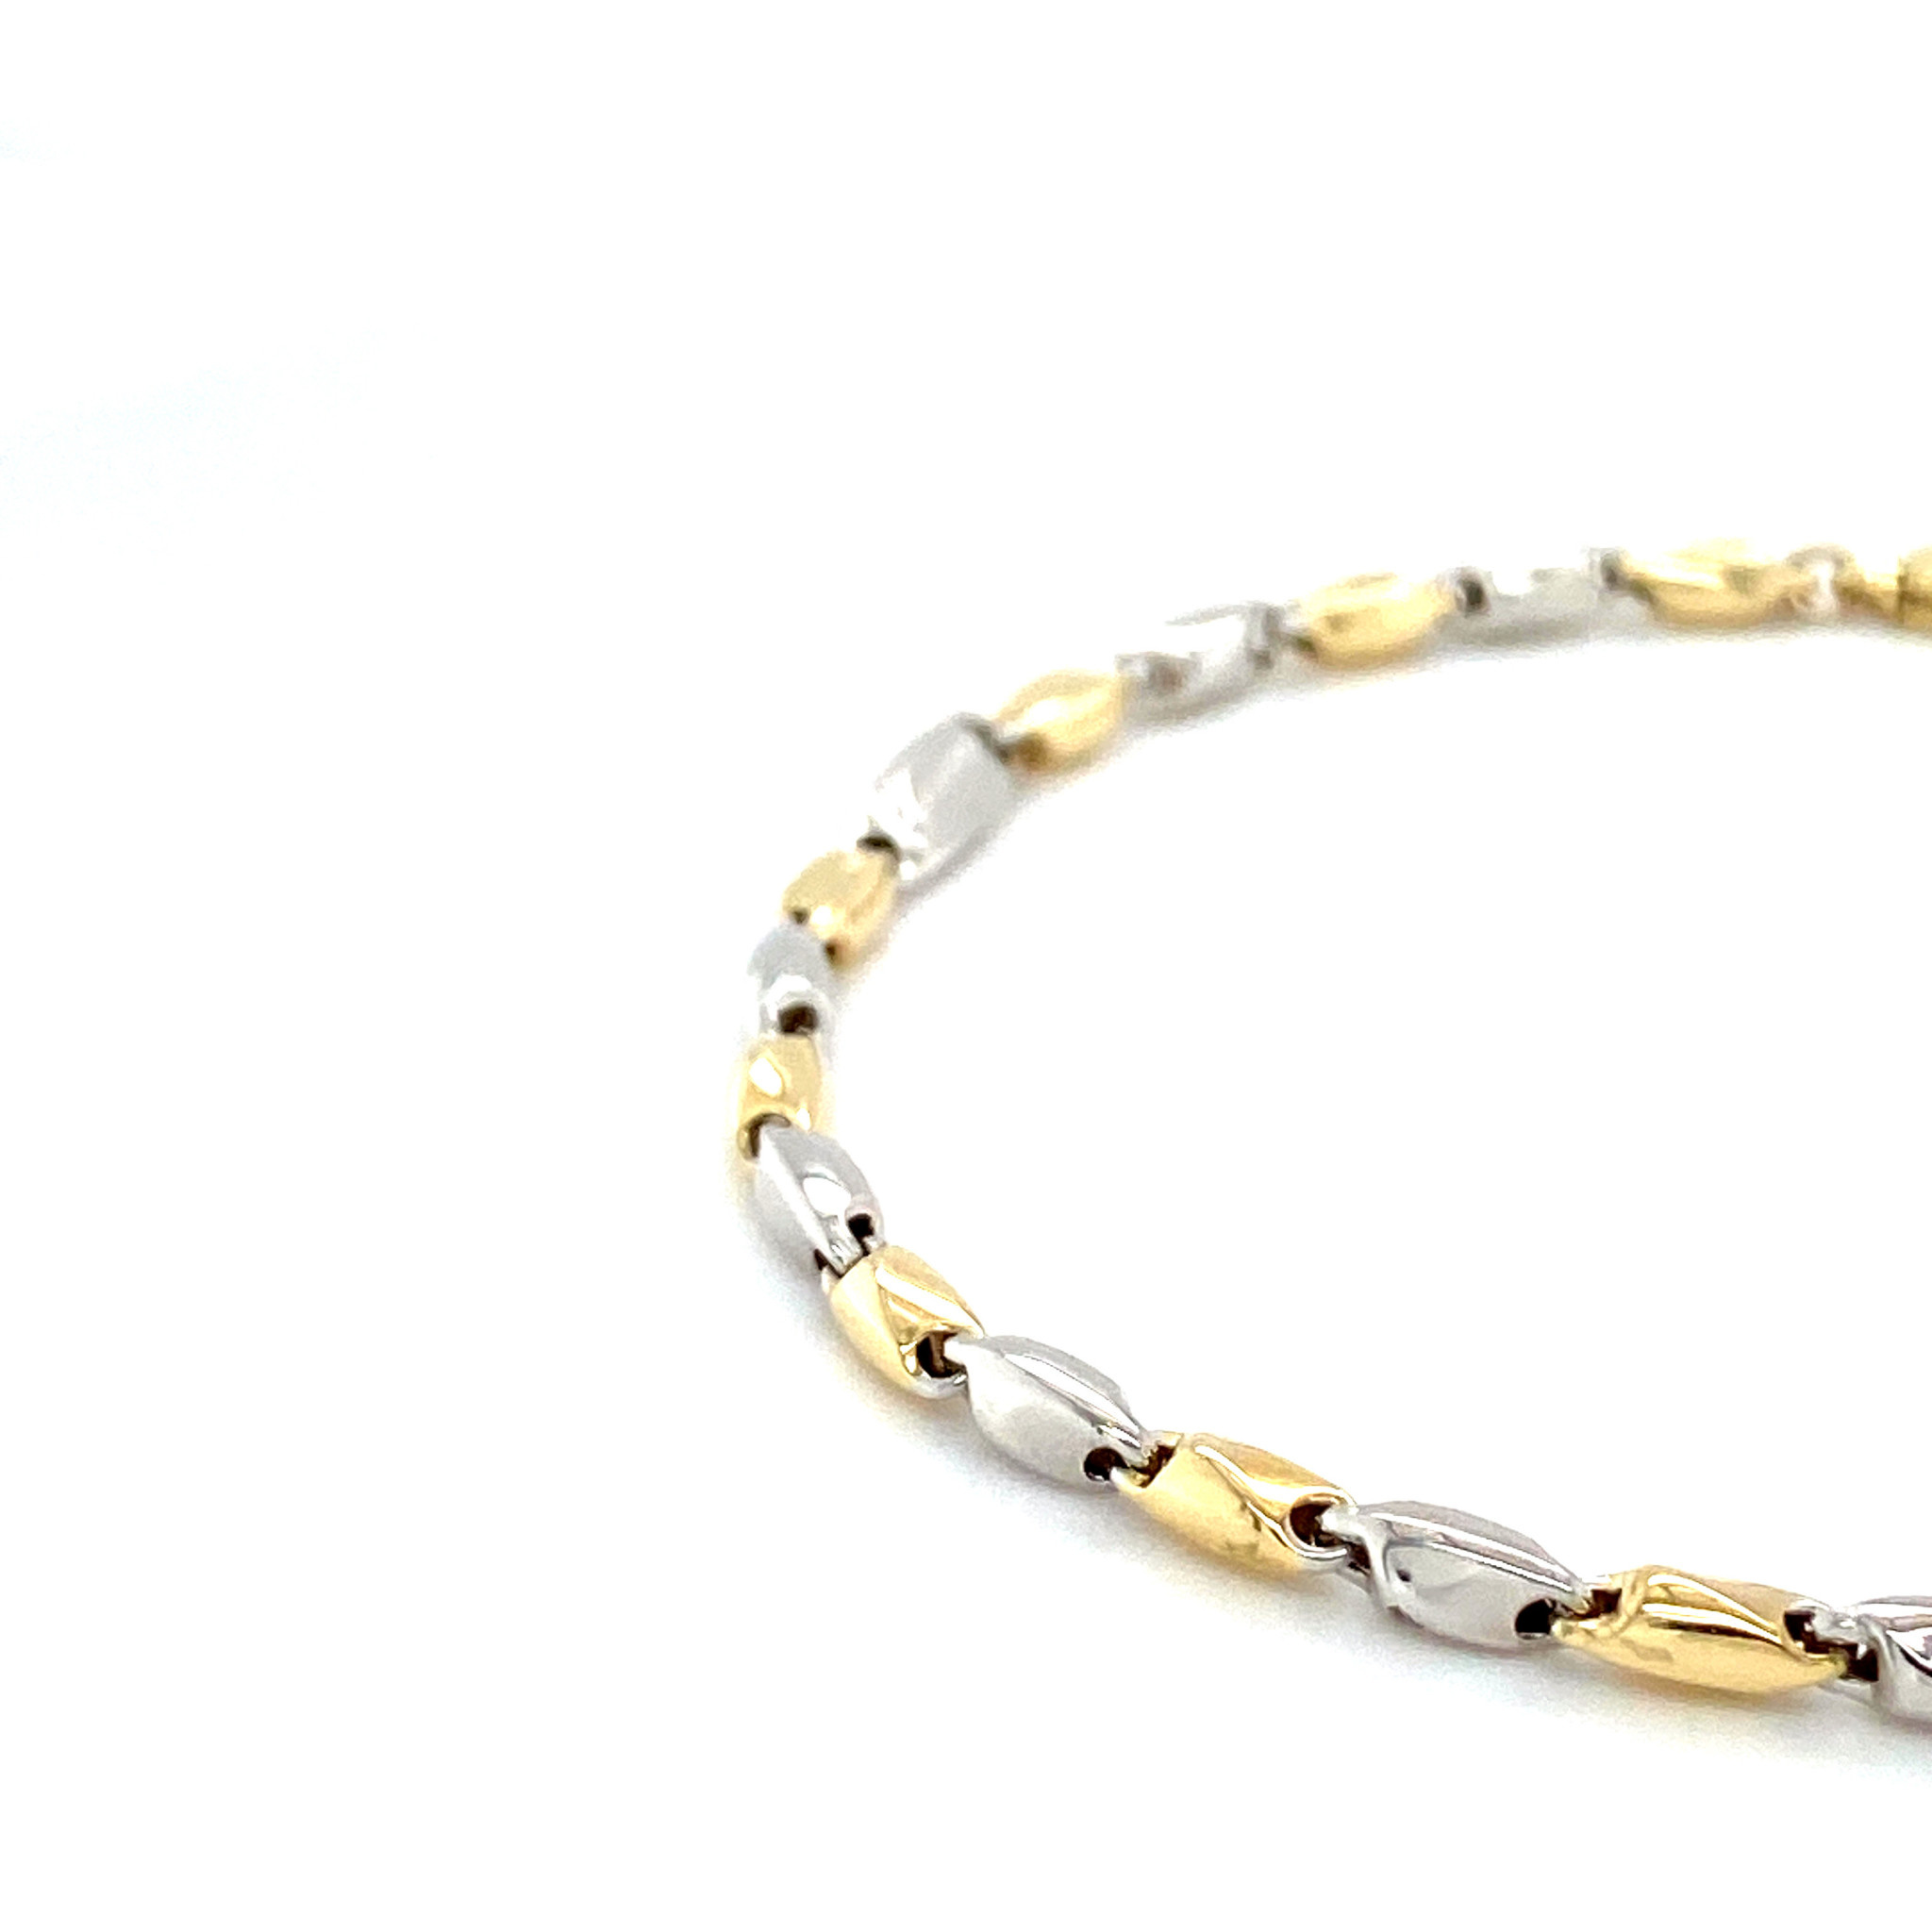 Monzario Oro Monzario armband 837Abic 19cm wit/geelgoud 14k.